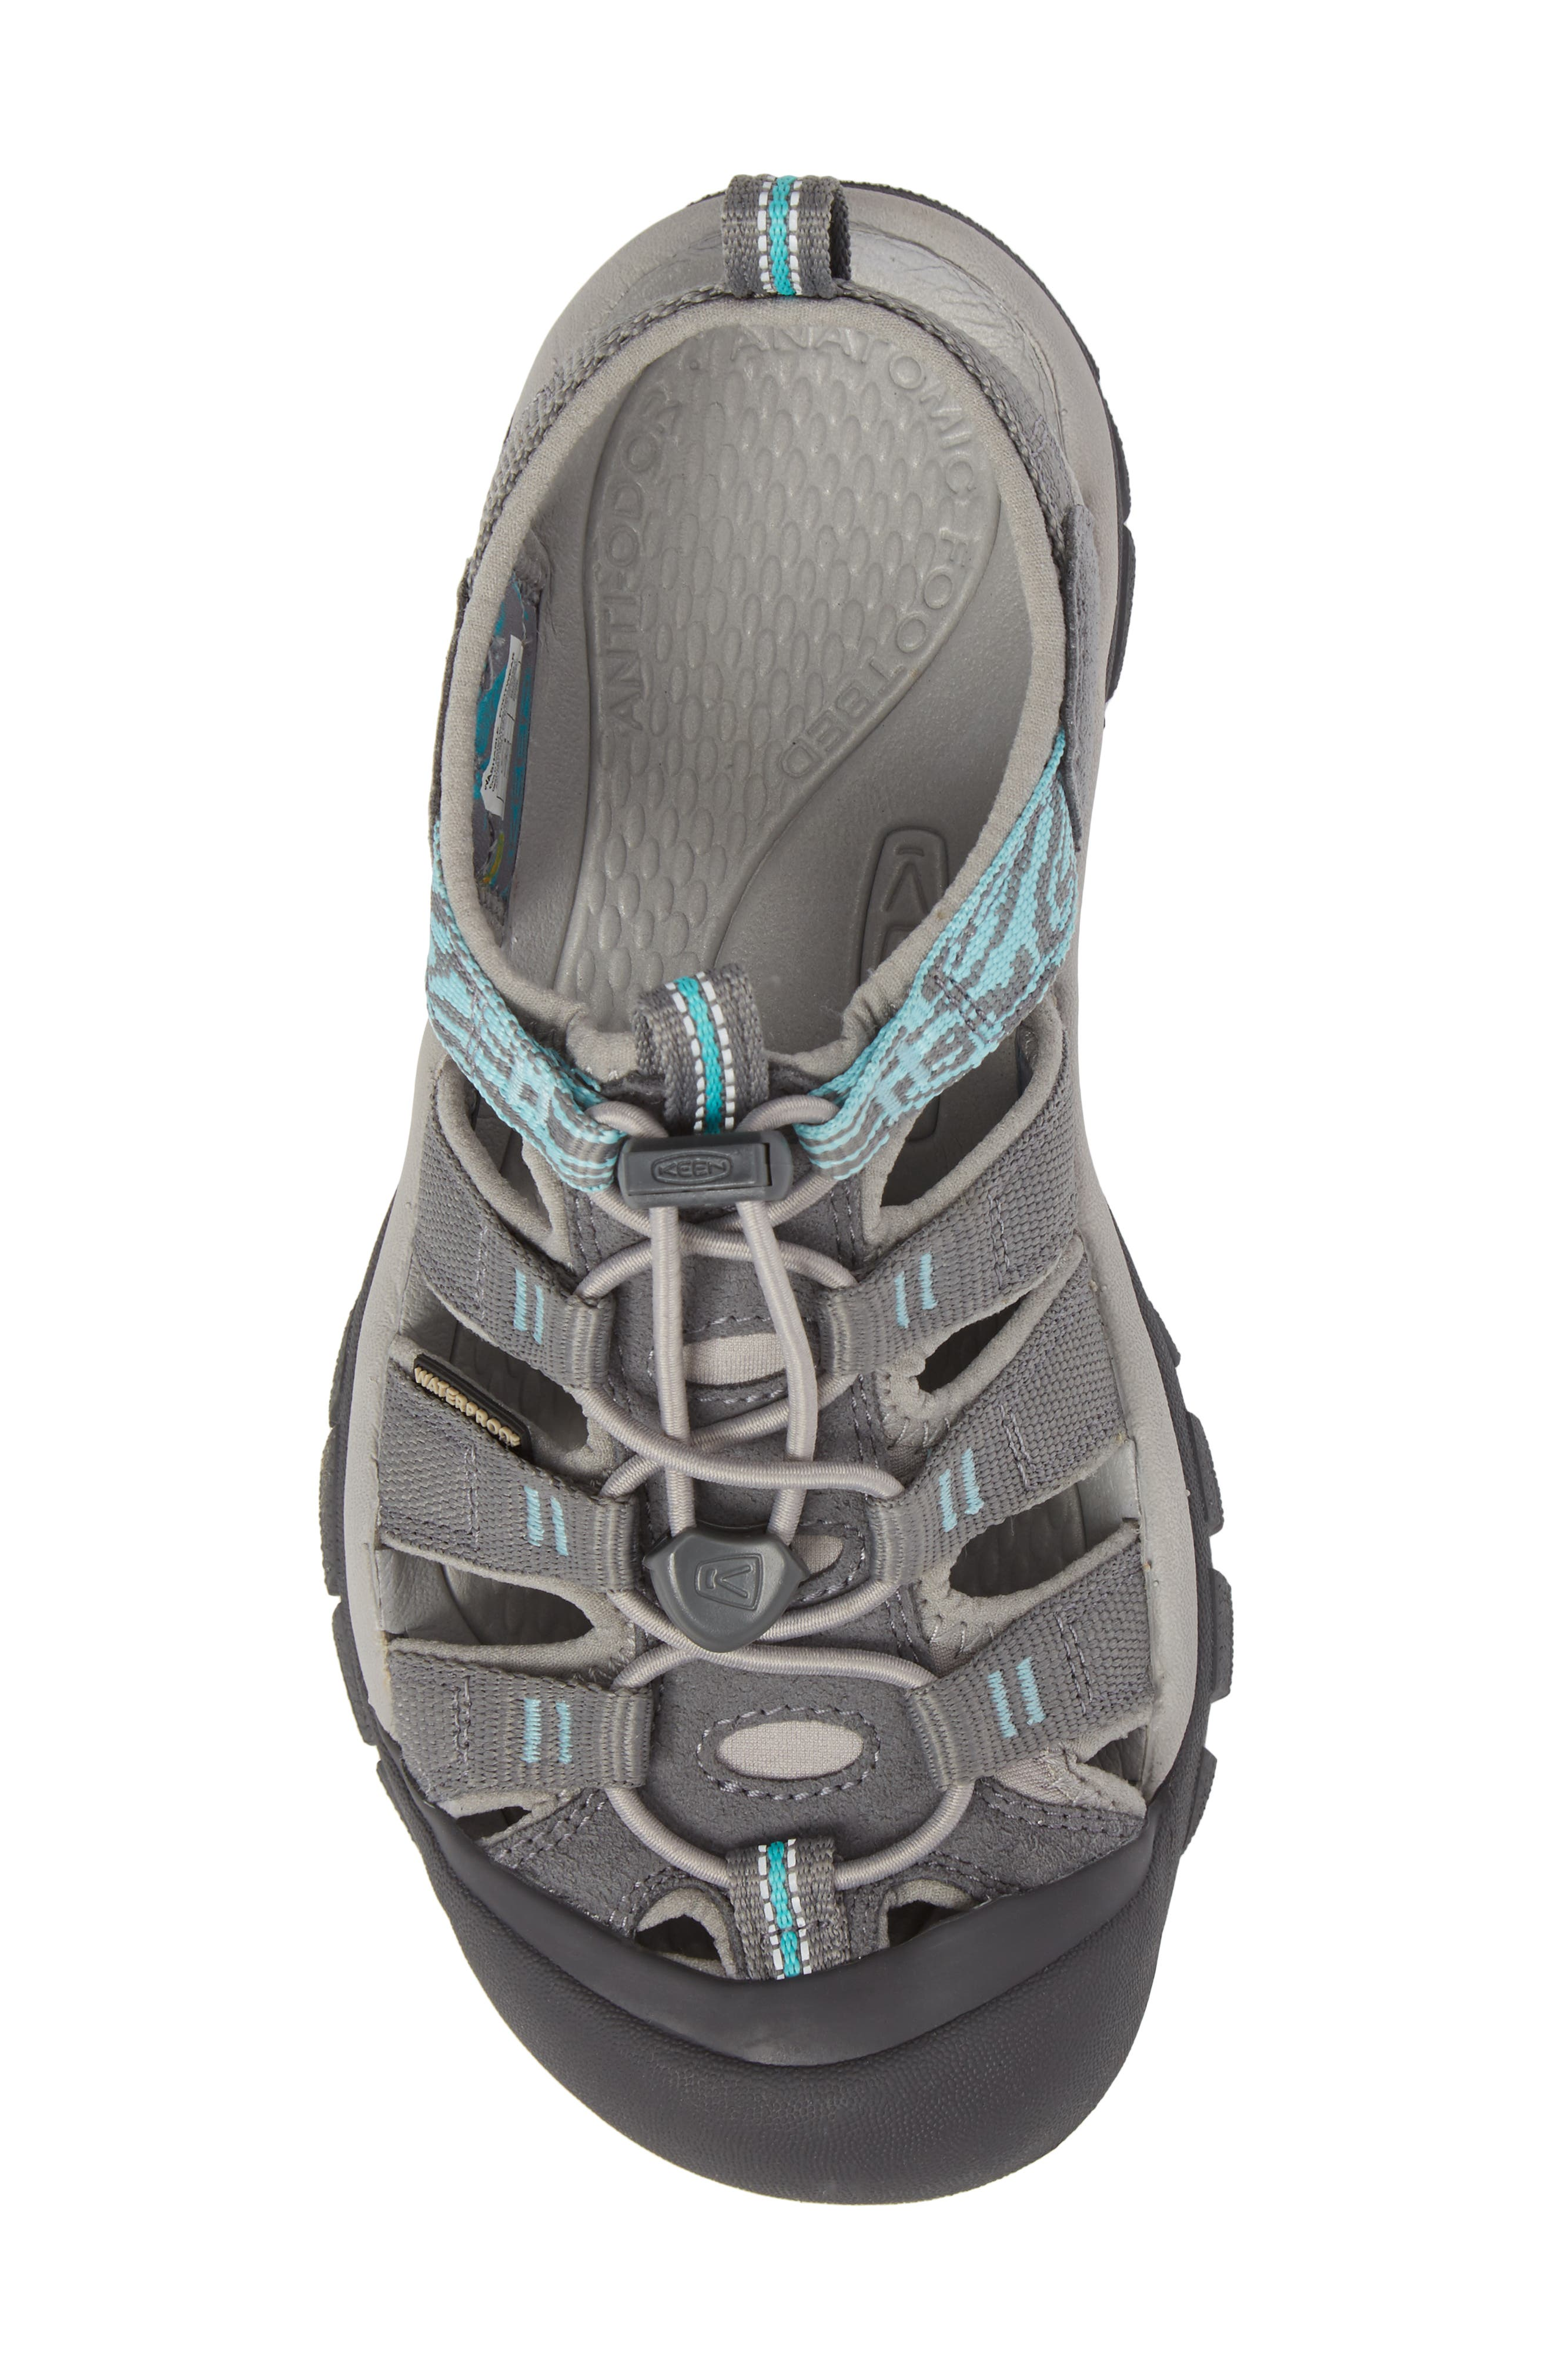 Newport Hydro Sandal,                             Alternate thumbnail 5, color,                             STEEL GREY/ BLUE TURQUOISE